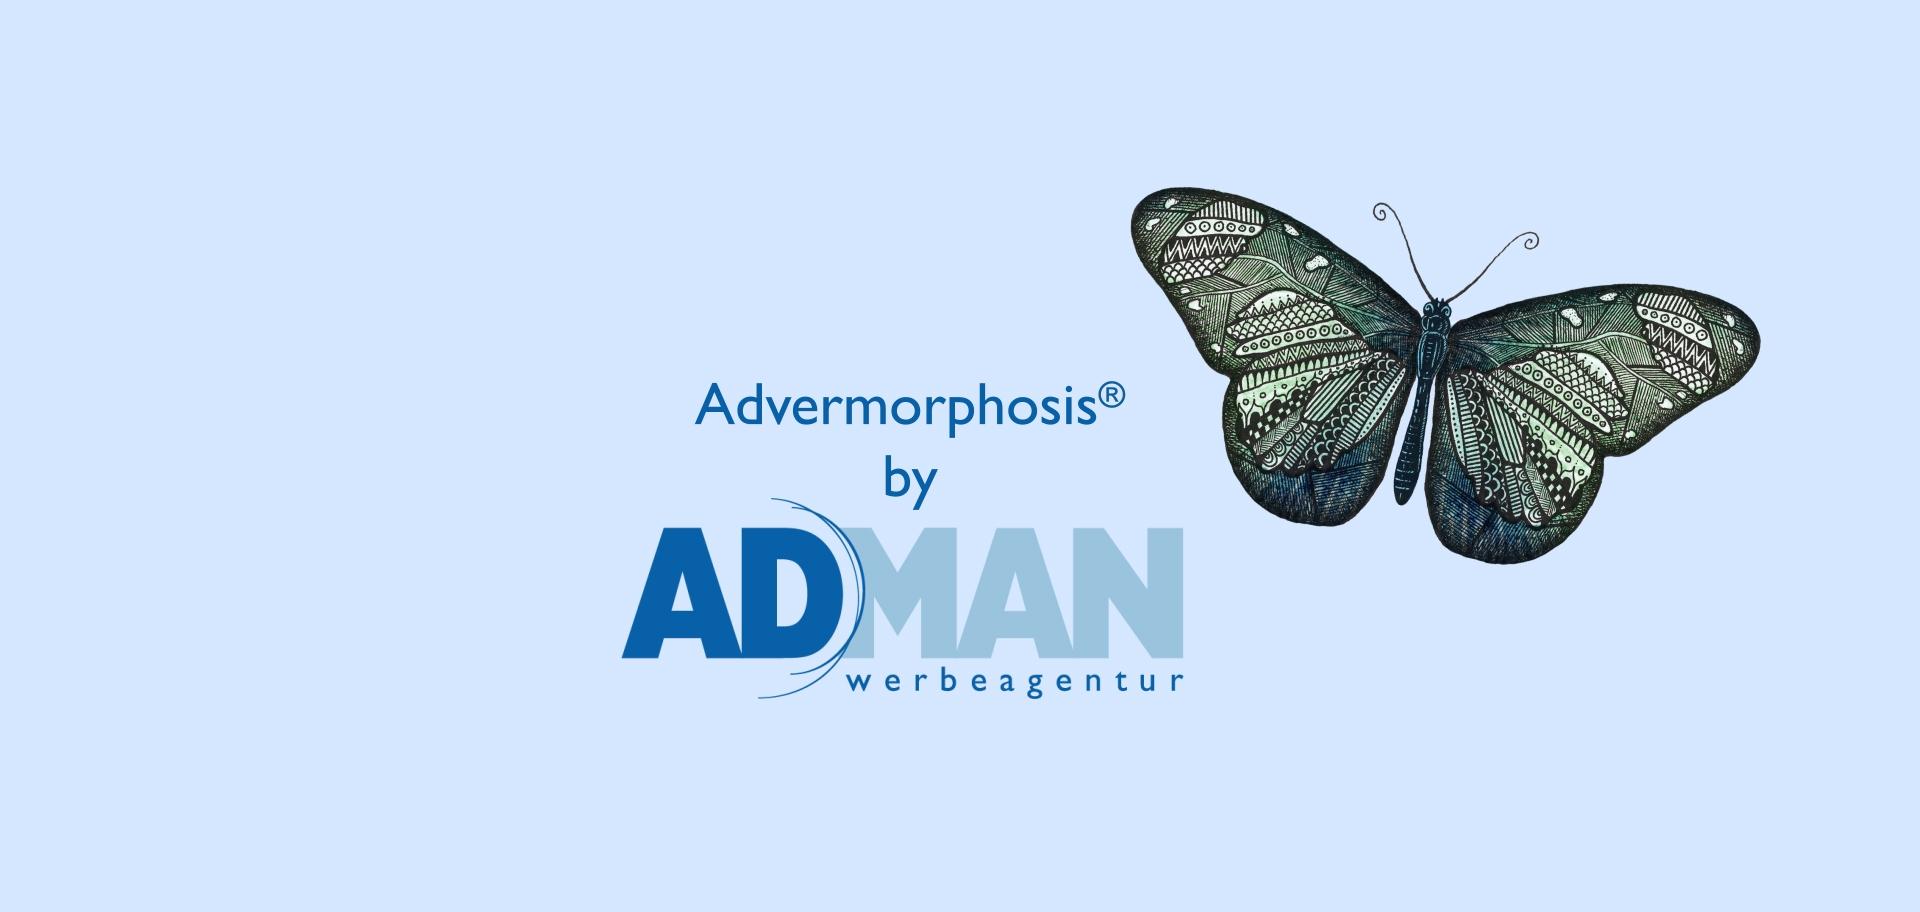 ADMAN Animation 2_00395.jpg